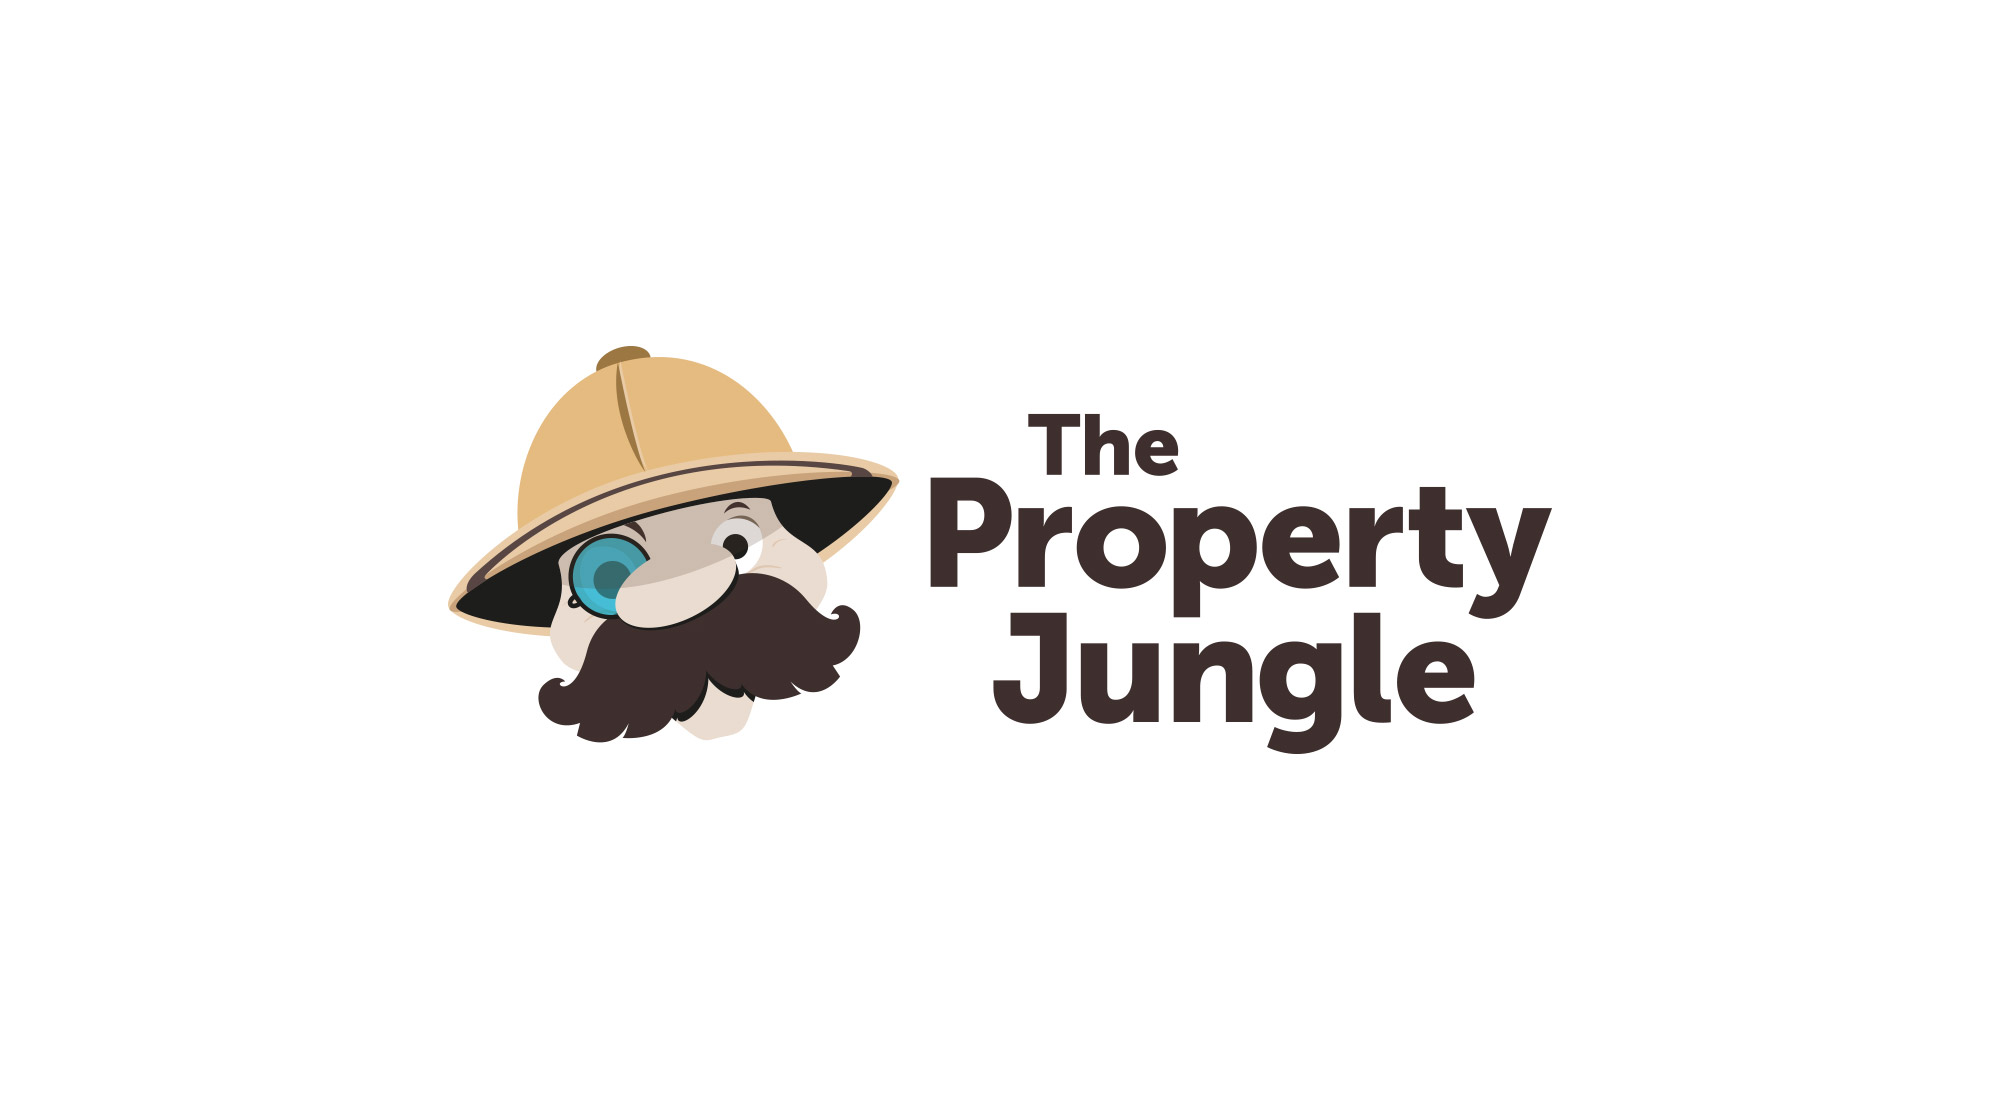 Property Jungle rebrand and logo design